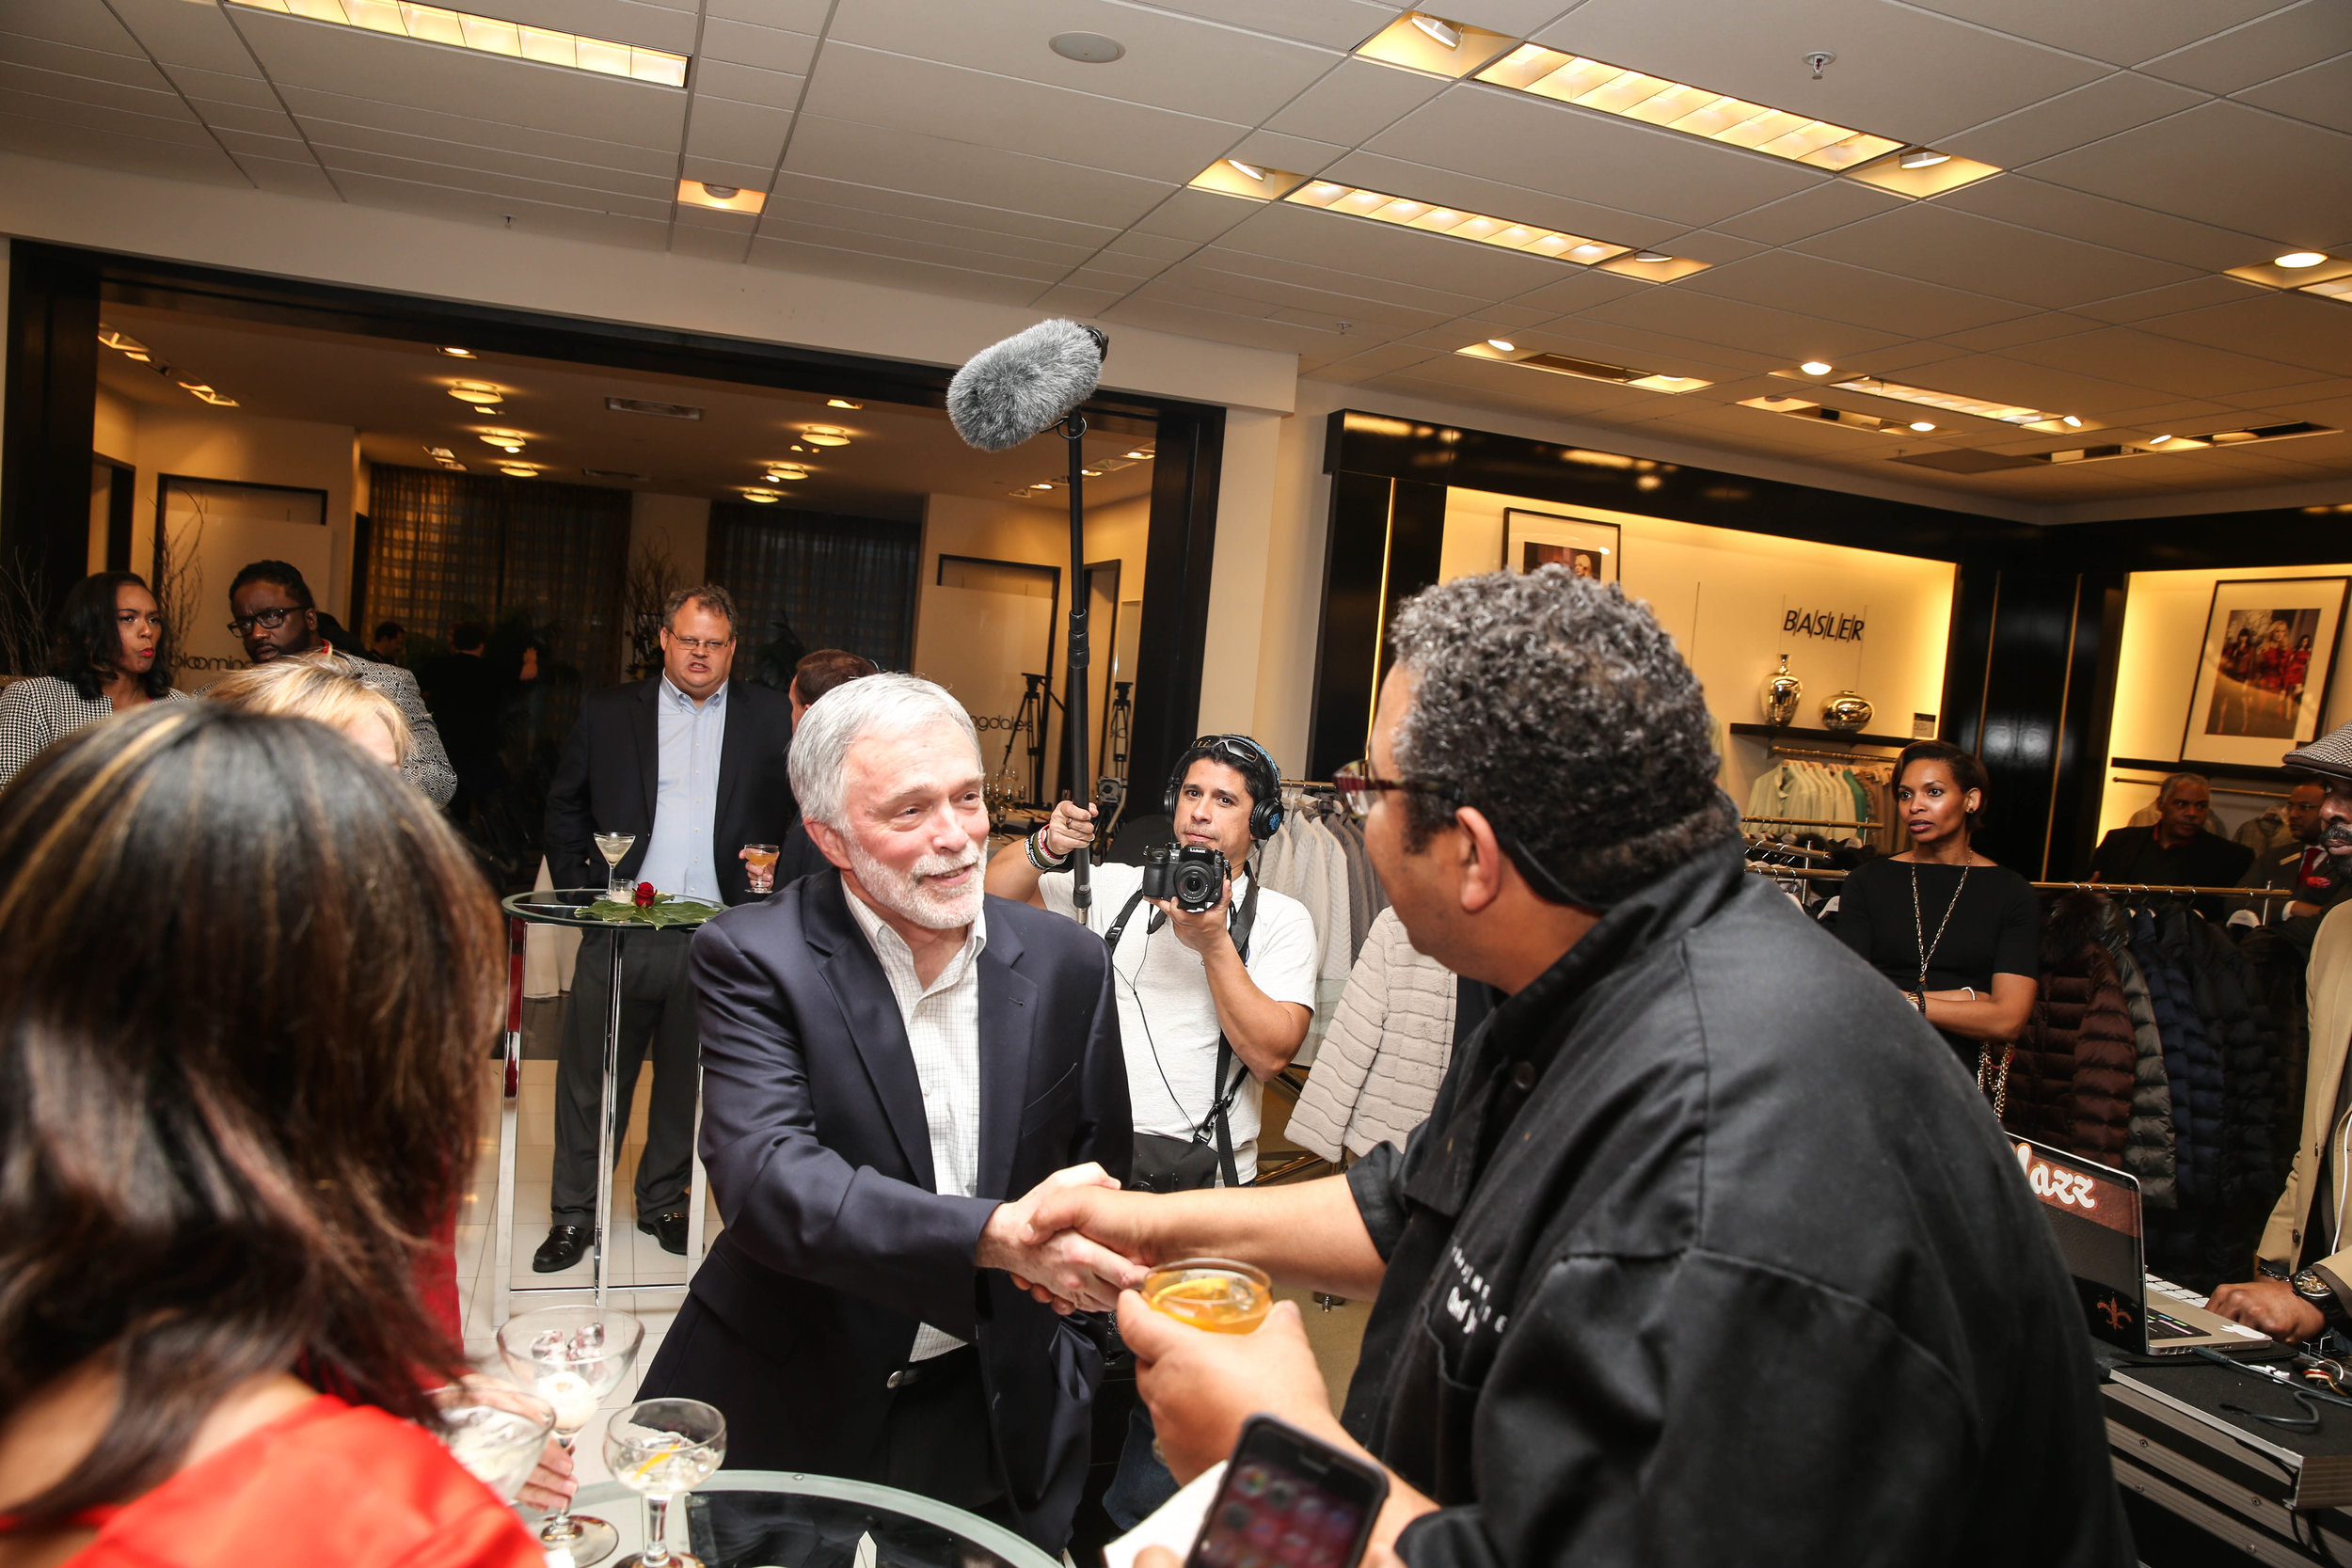 Juan Greeting Guests as Camera Roll